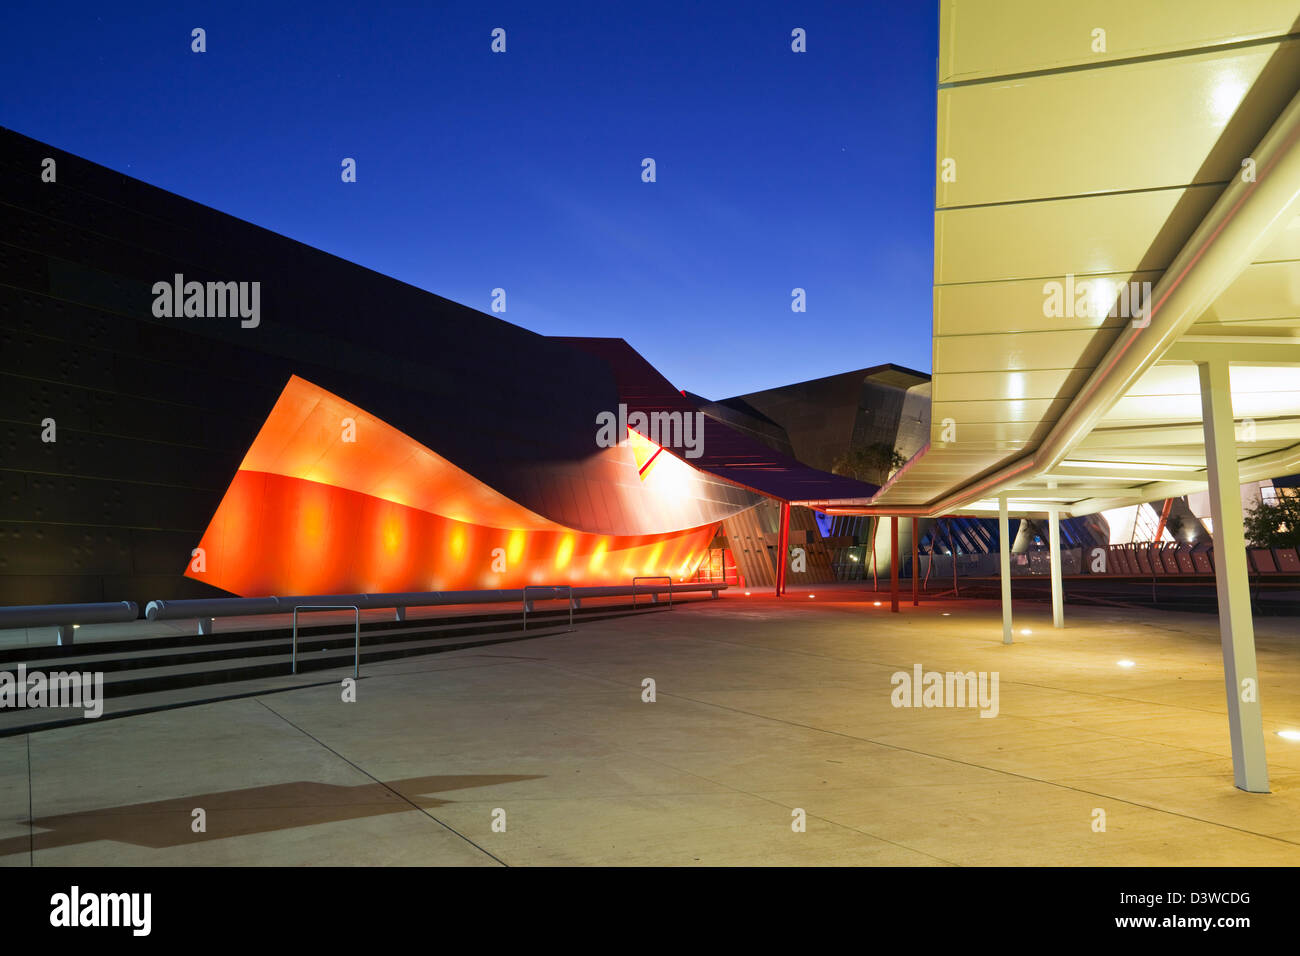 Arquitectura de la entrada al Museo Nacional de Australia. Canberra, Australian Capital Territory (ACT), Australia Imagen De Stock